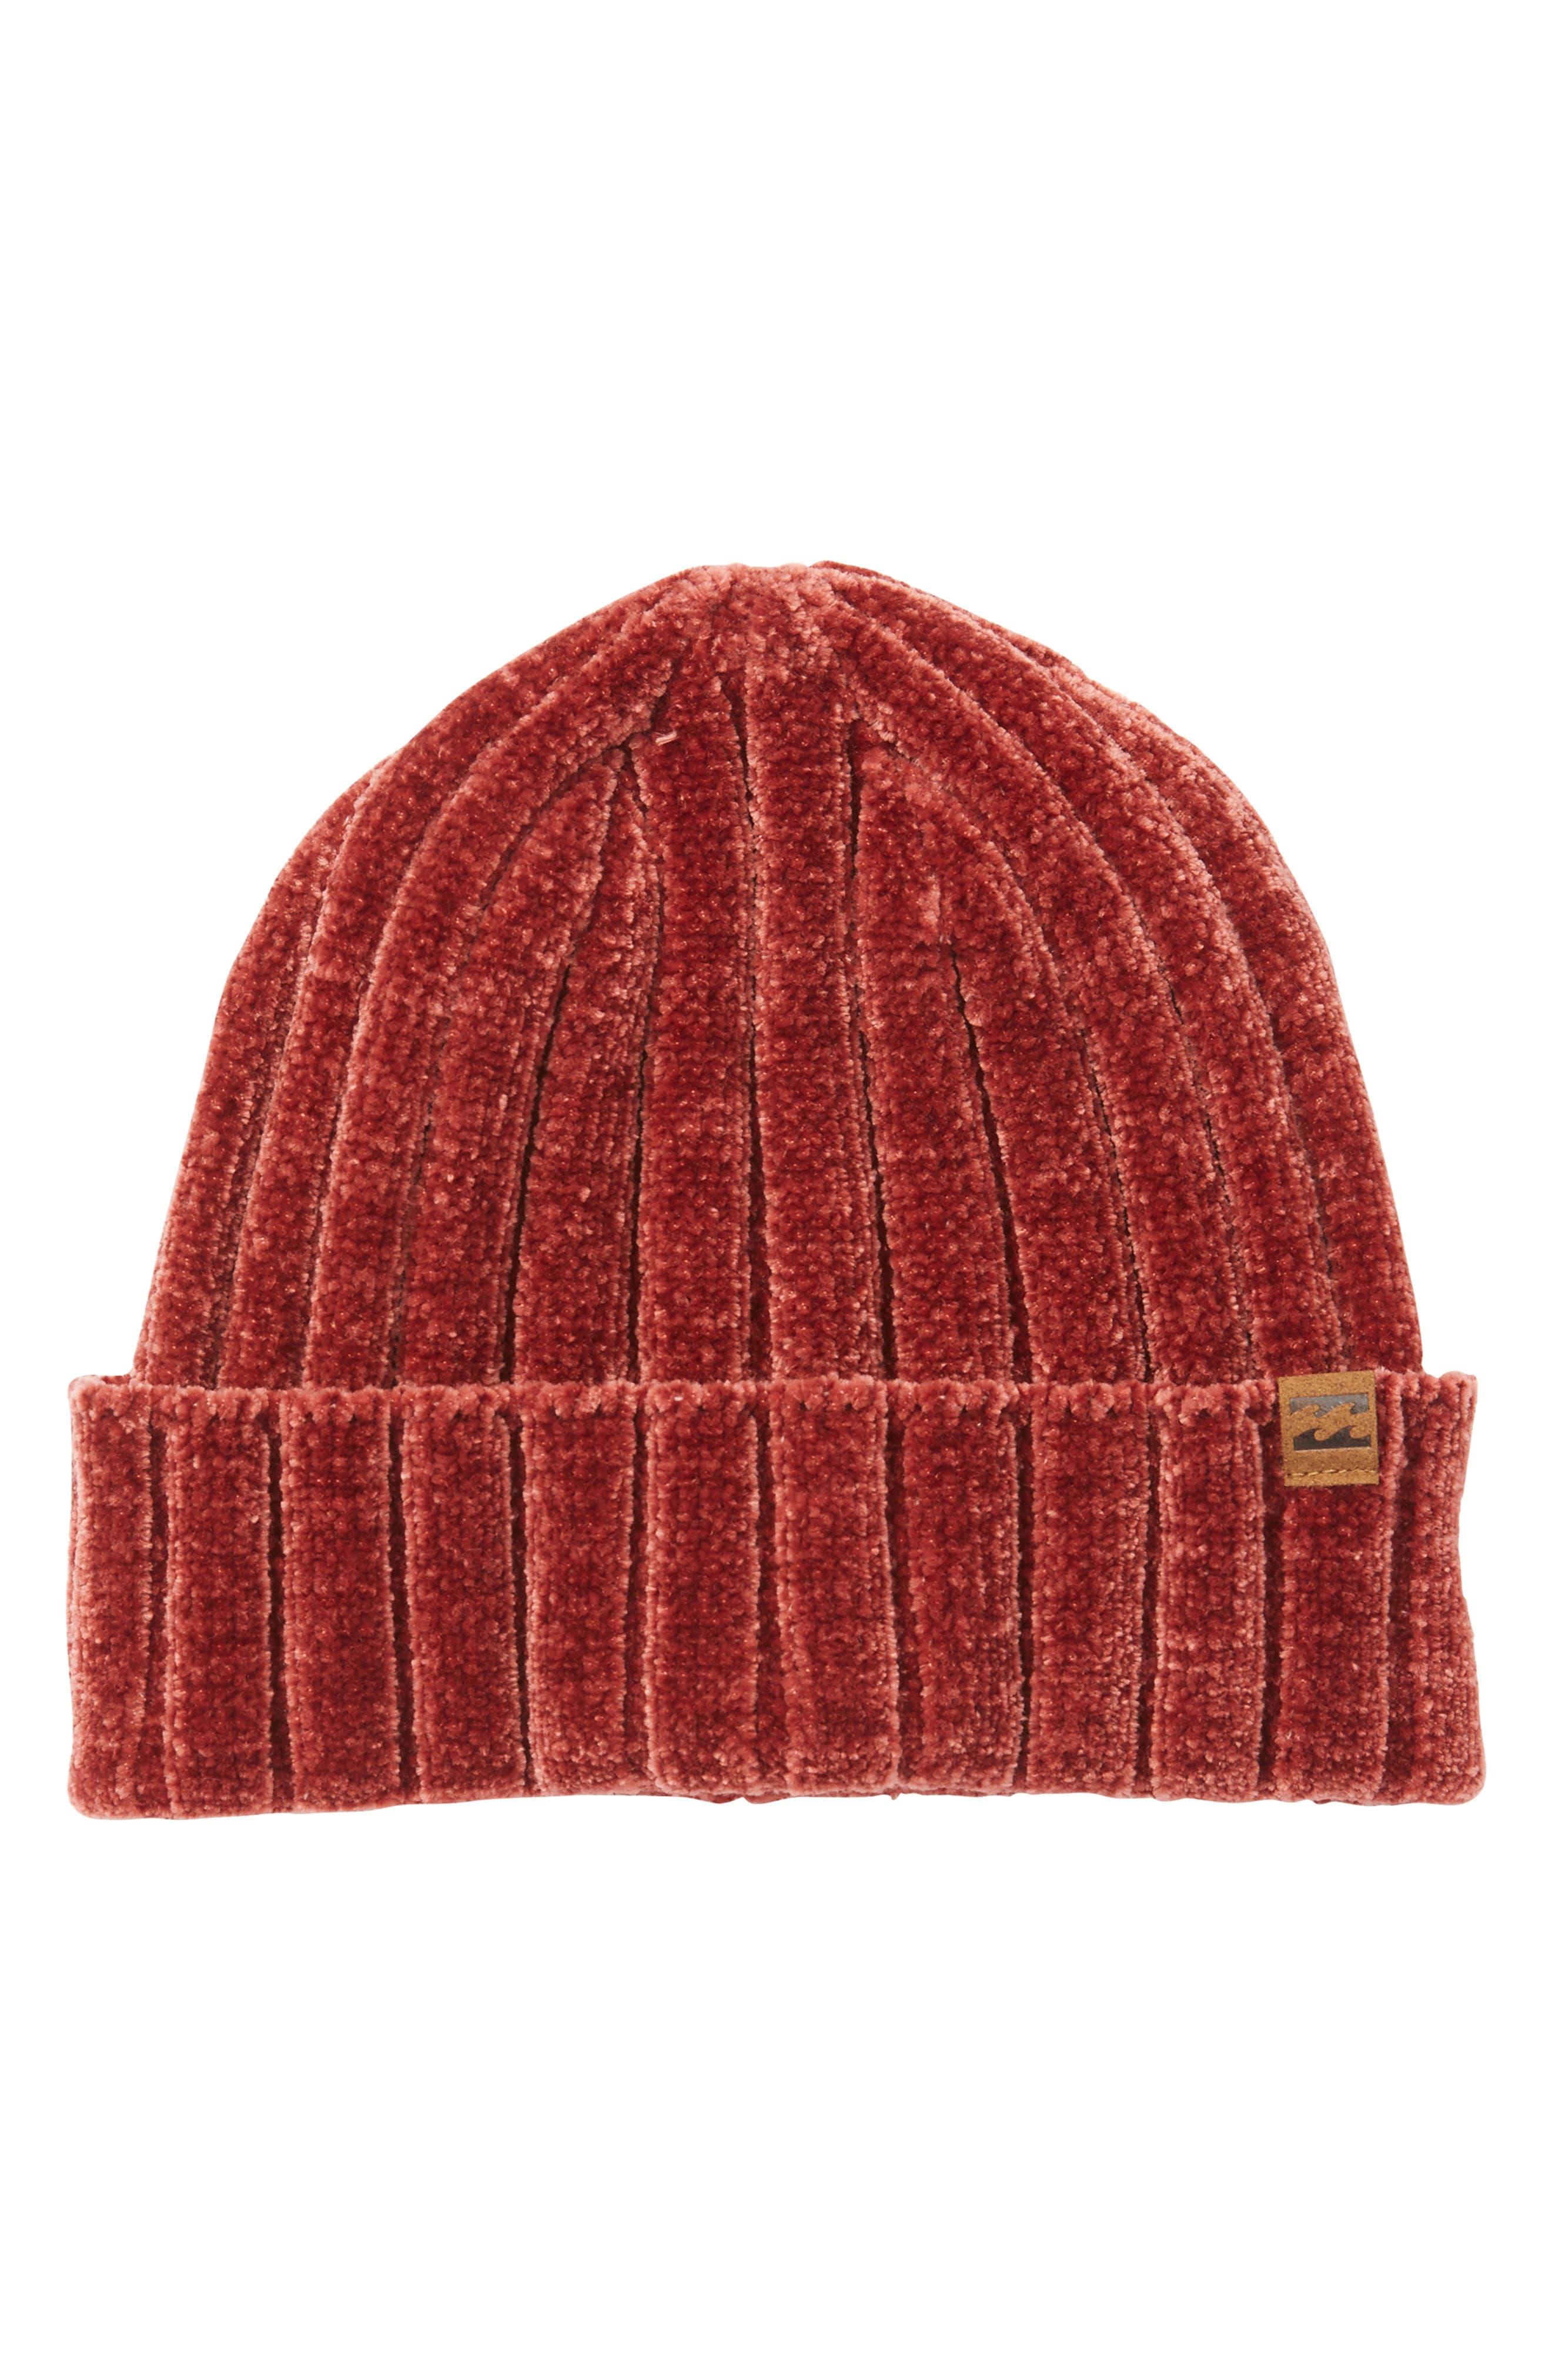 Billabong Warm Up Chenille Beanie - Red